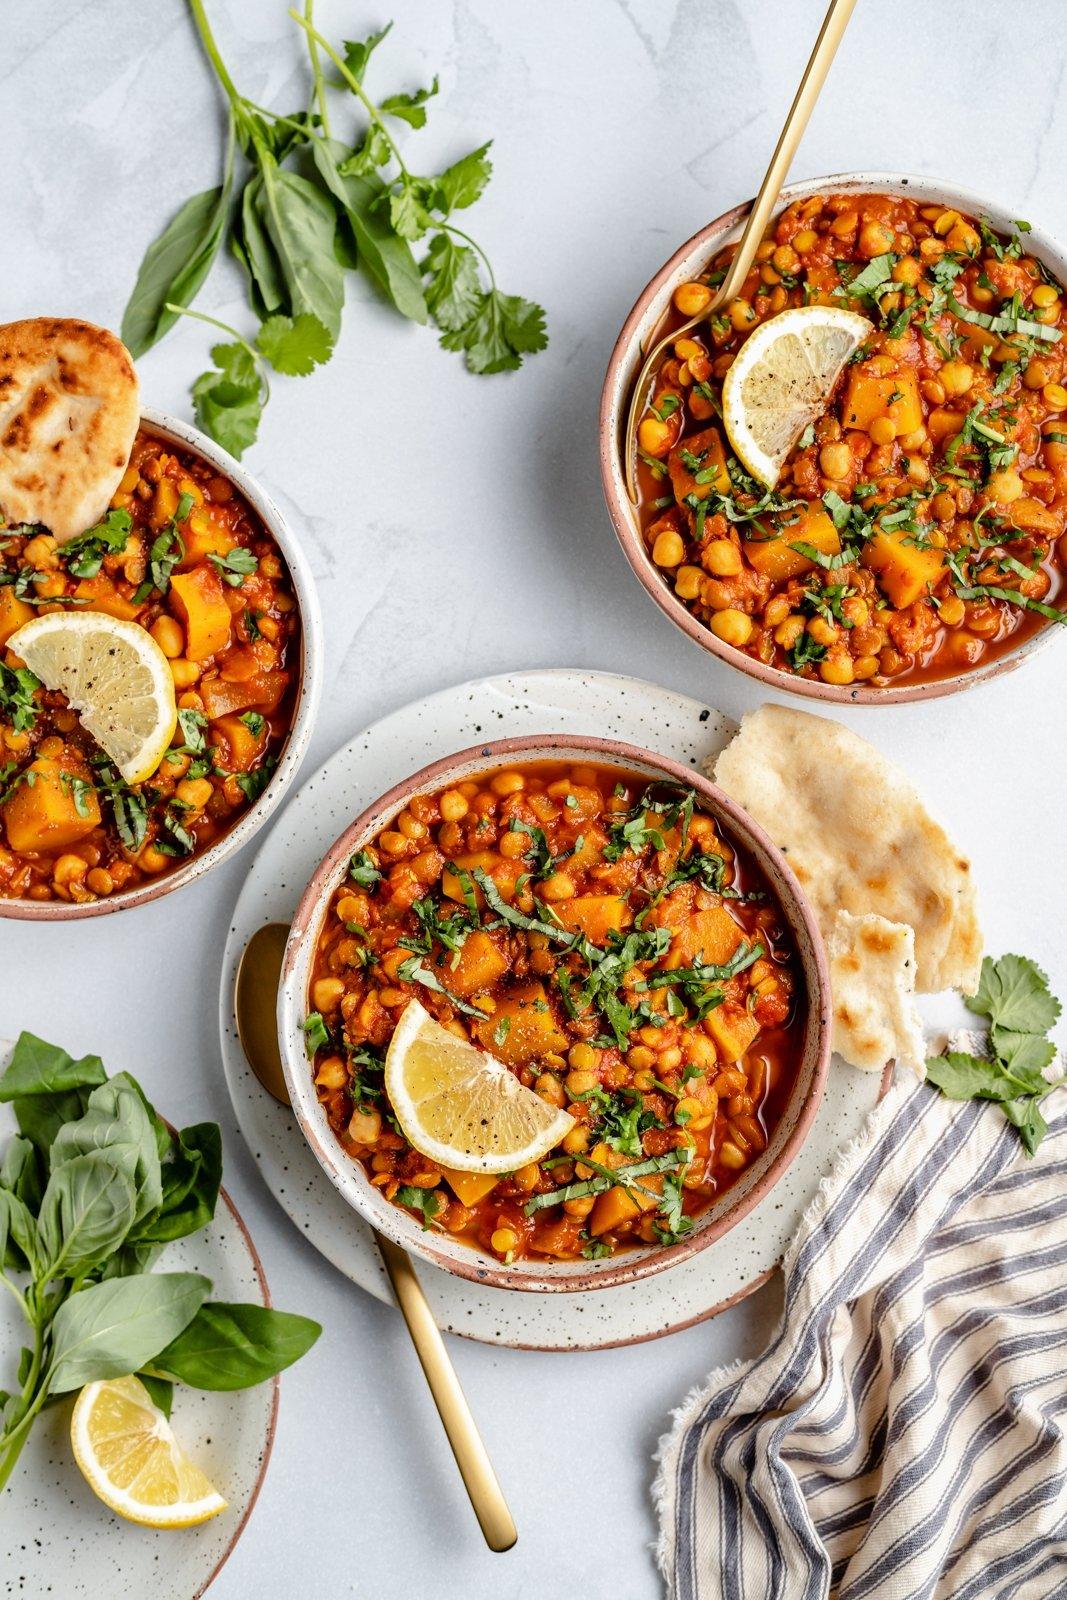 vegan Moroccan stew in three bowls with lemon wedges